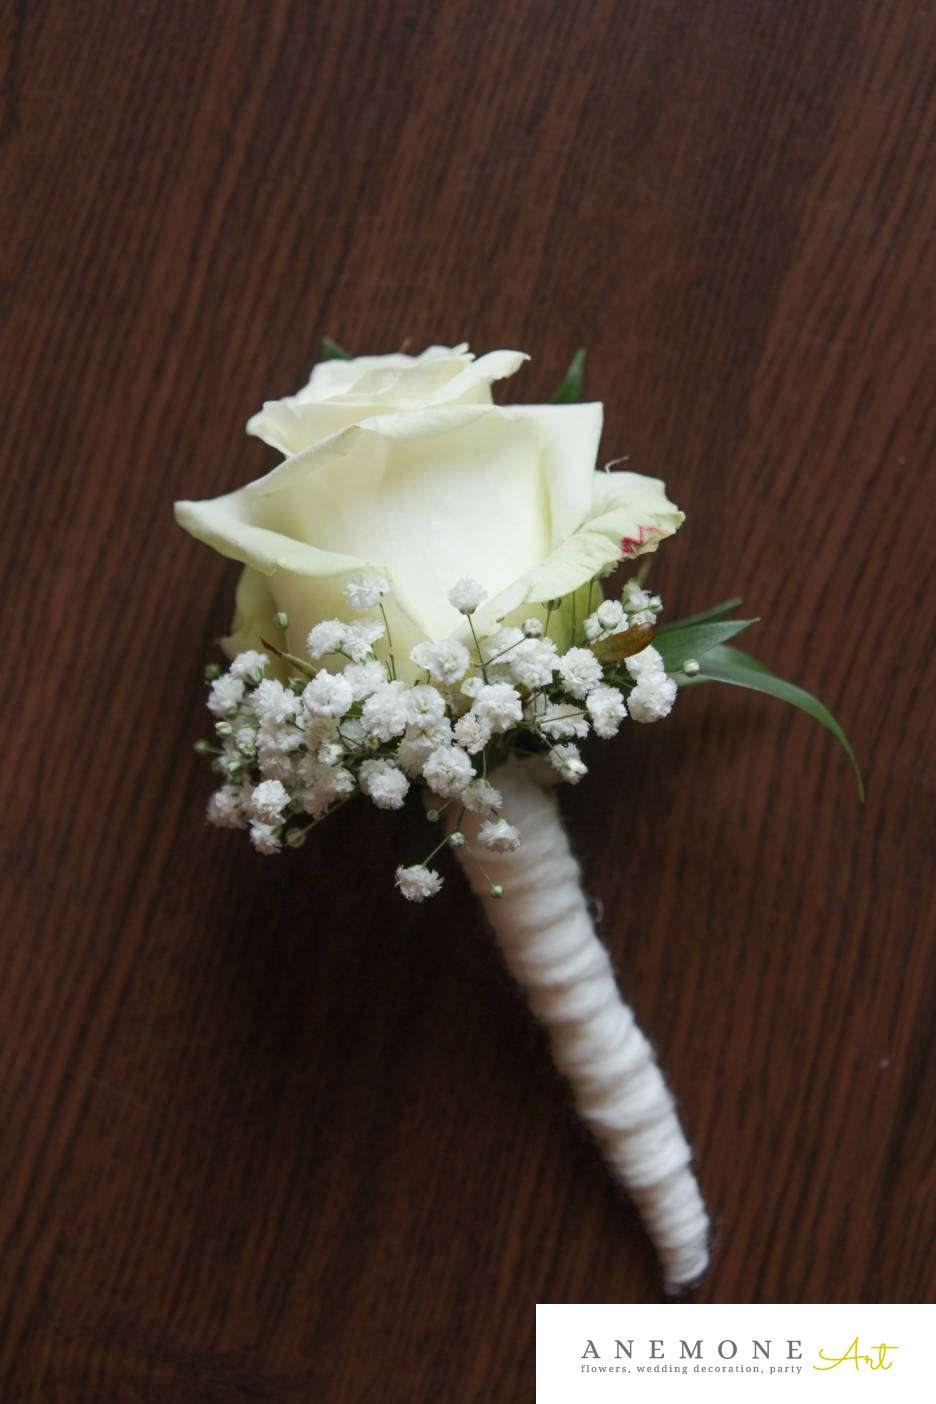 Poza, foto cu Flori de nunta alb, cocarda, gipsofila, trandafiri in Arad, Timisoara, Oradea (wedding flowers, bouquets) nunta Arad, Timisoara, Oradea